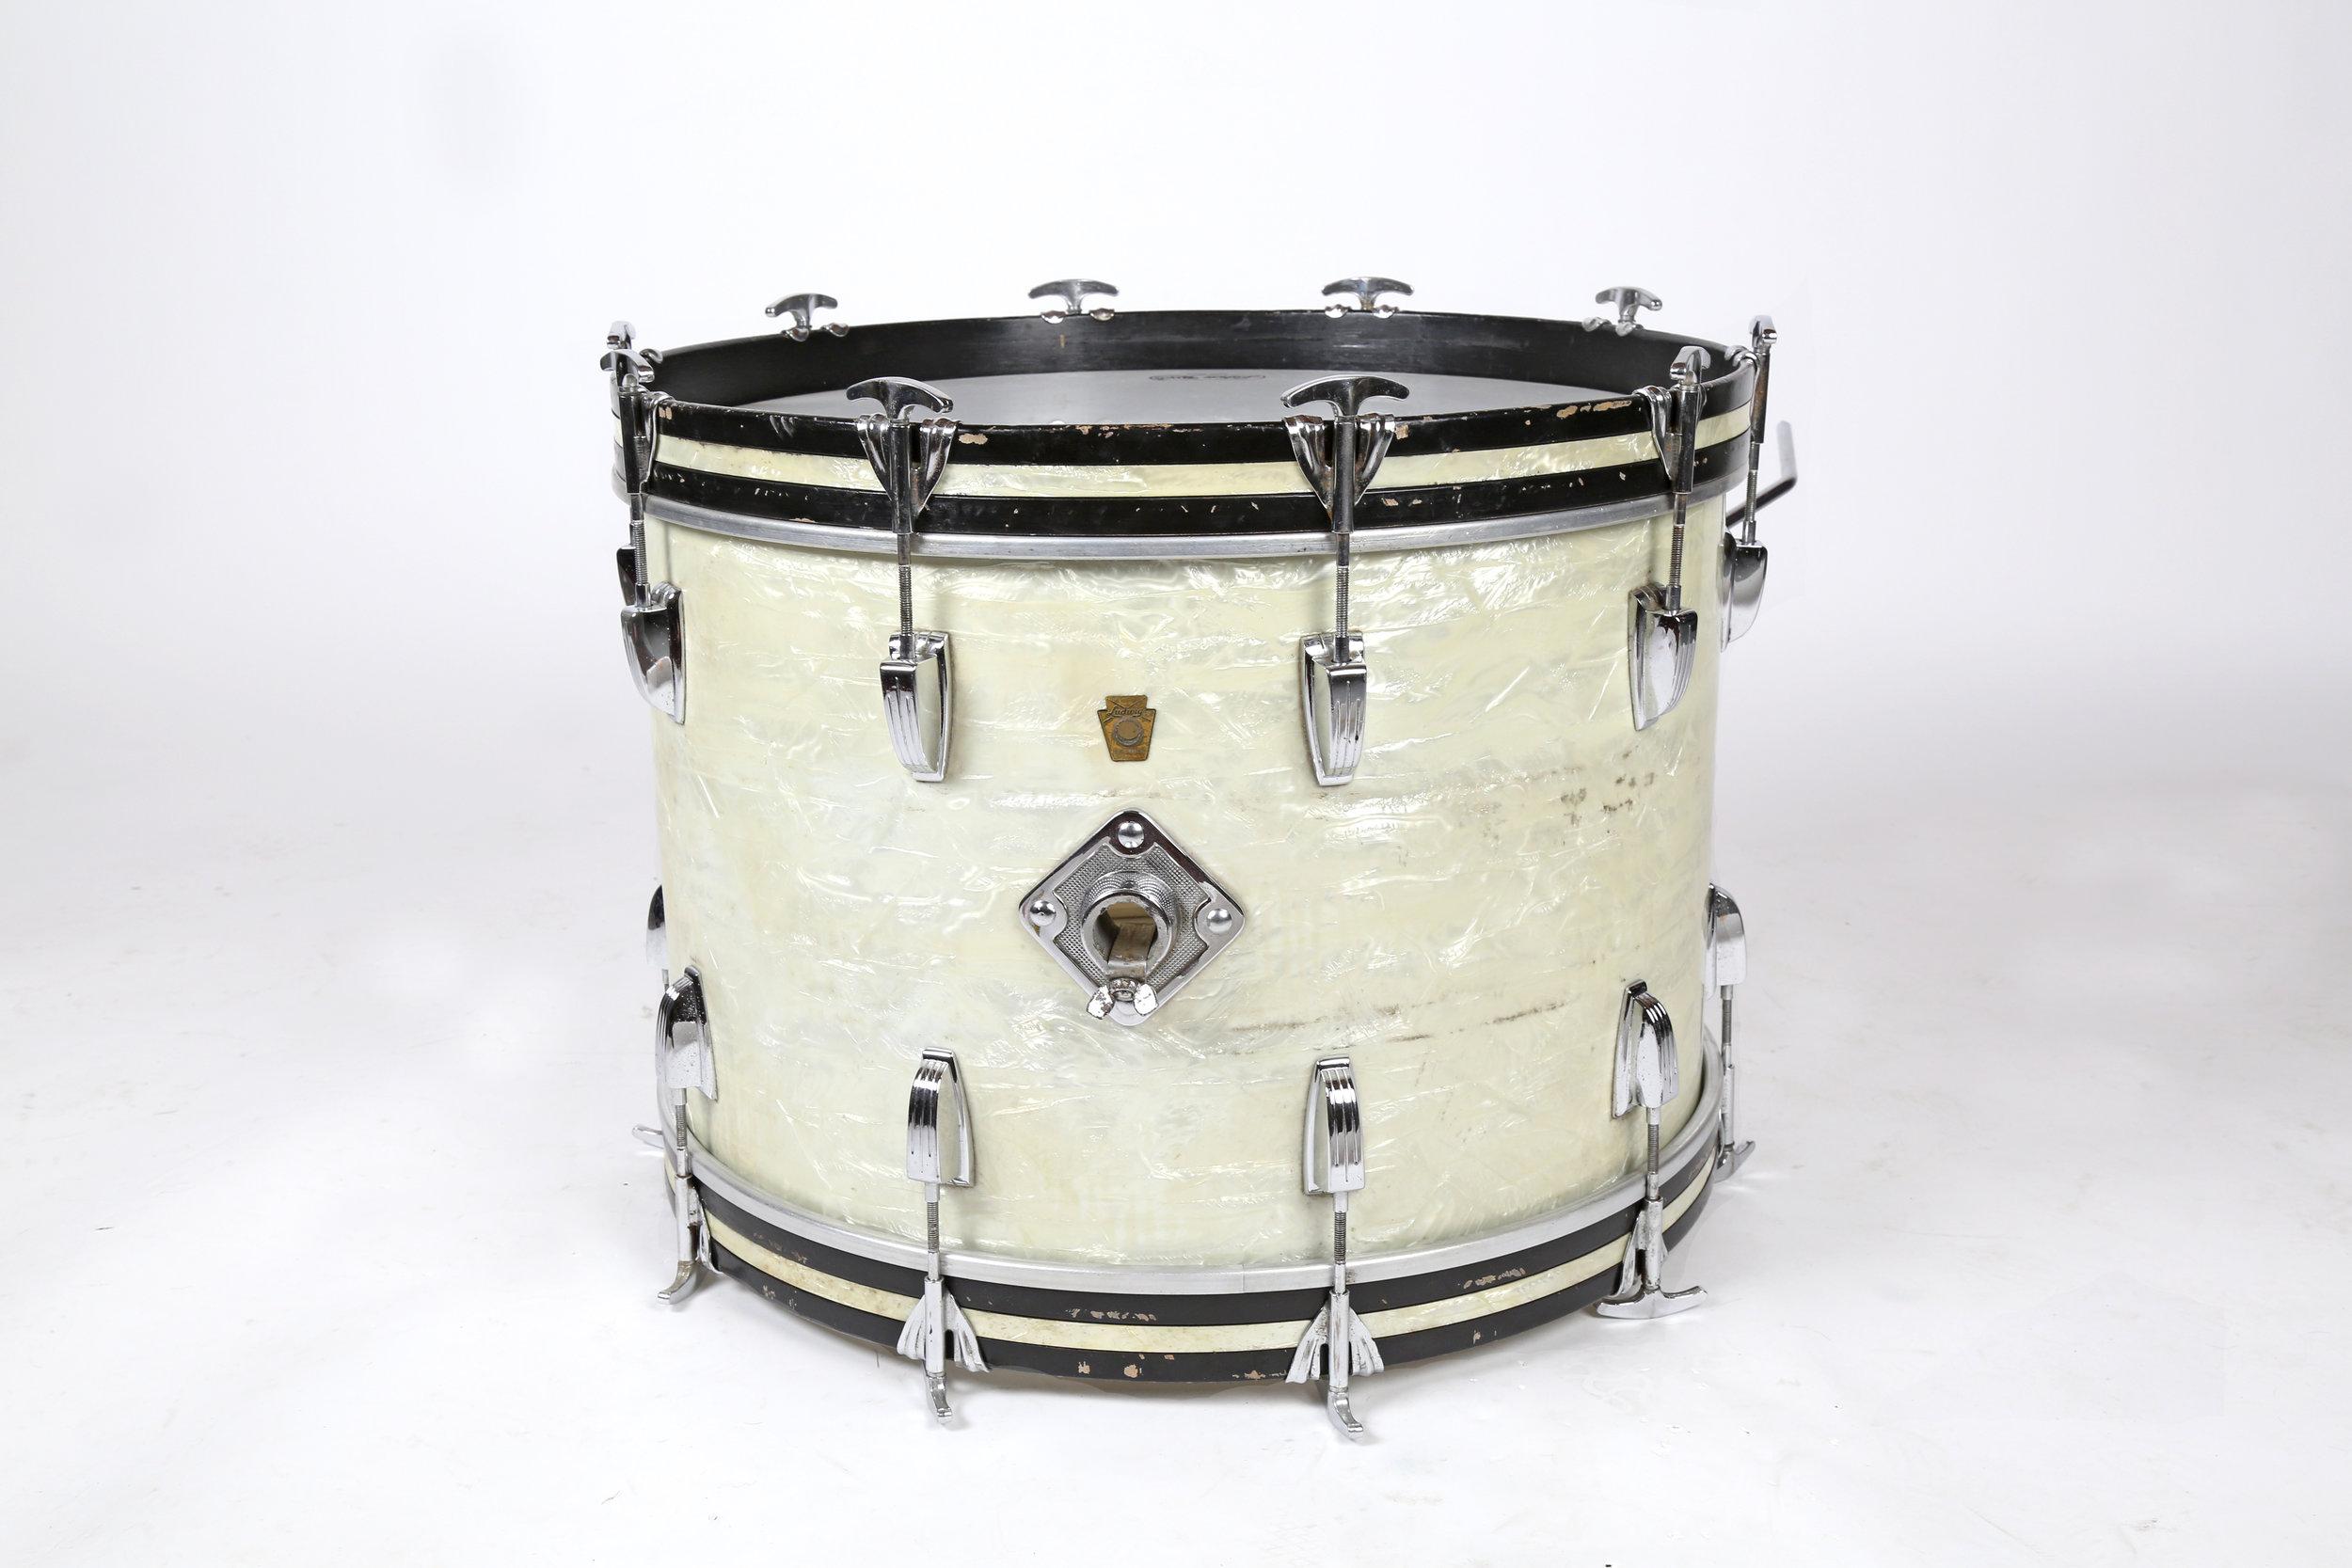 Dorio Vintage Drum_C&C Big Red_1950.jpg